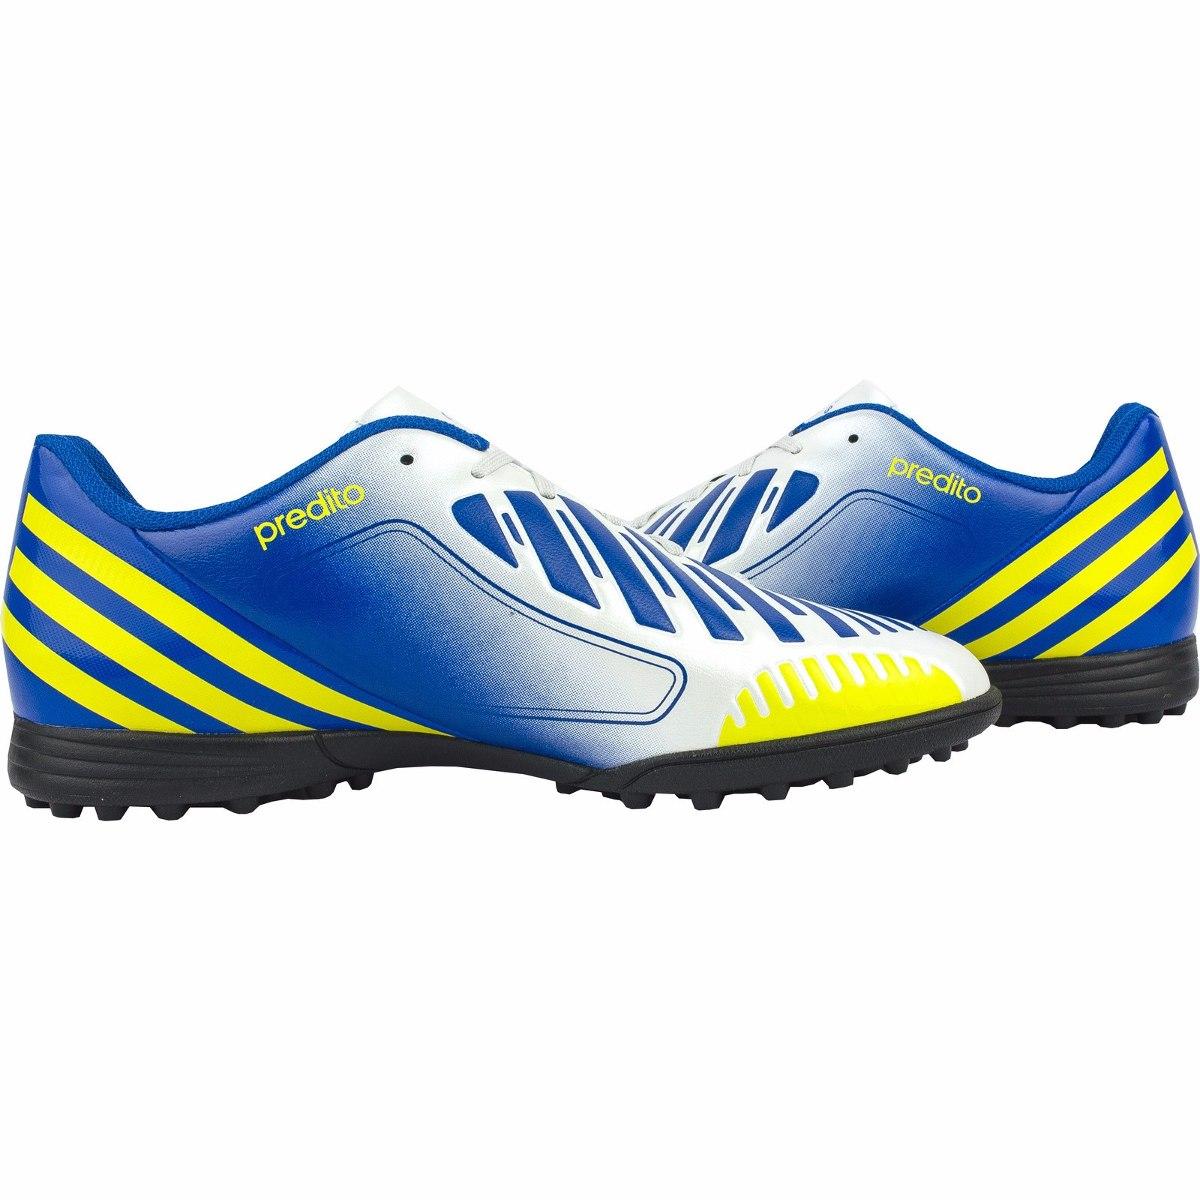 adidas Predito Lz Trx Tf G64964 Multitaco -   950.00 en Mercado Libre 20c386a03c225